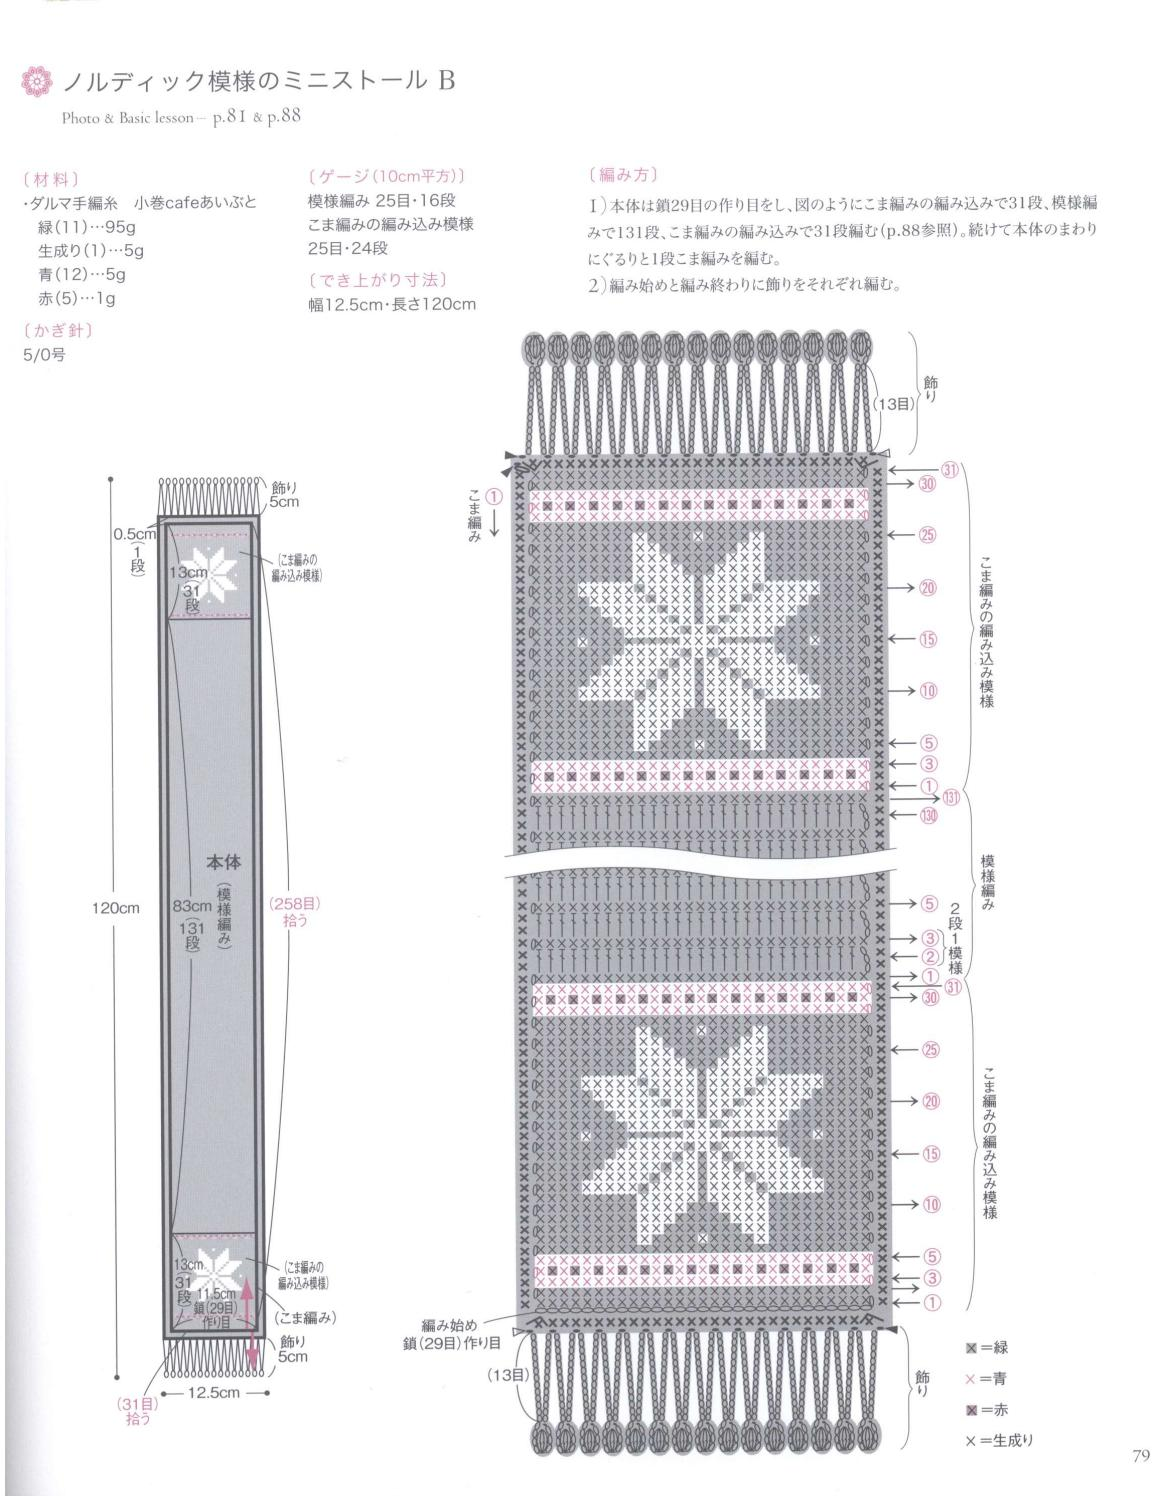 Asahi original crochet best selection 2012 page 79